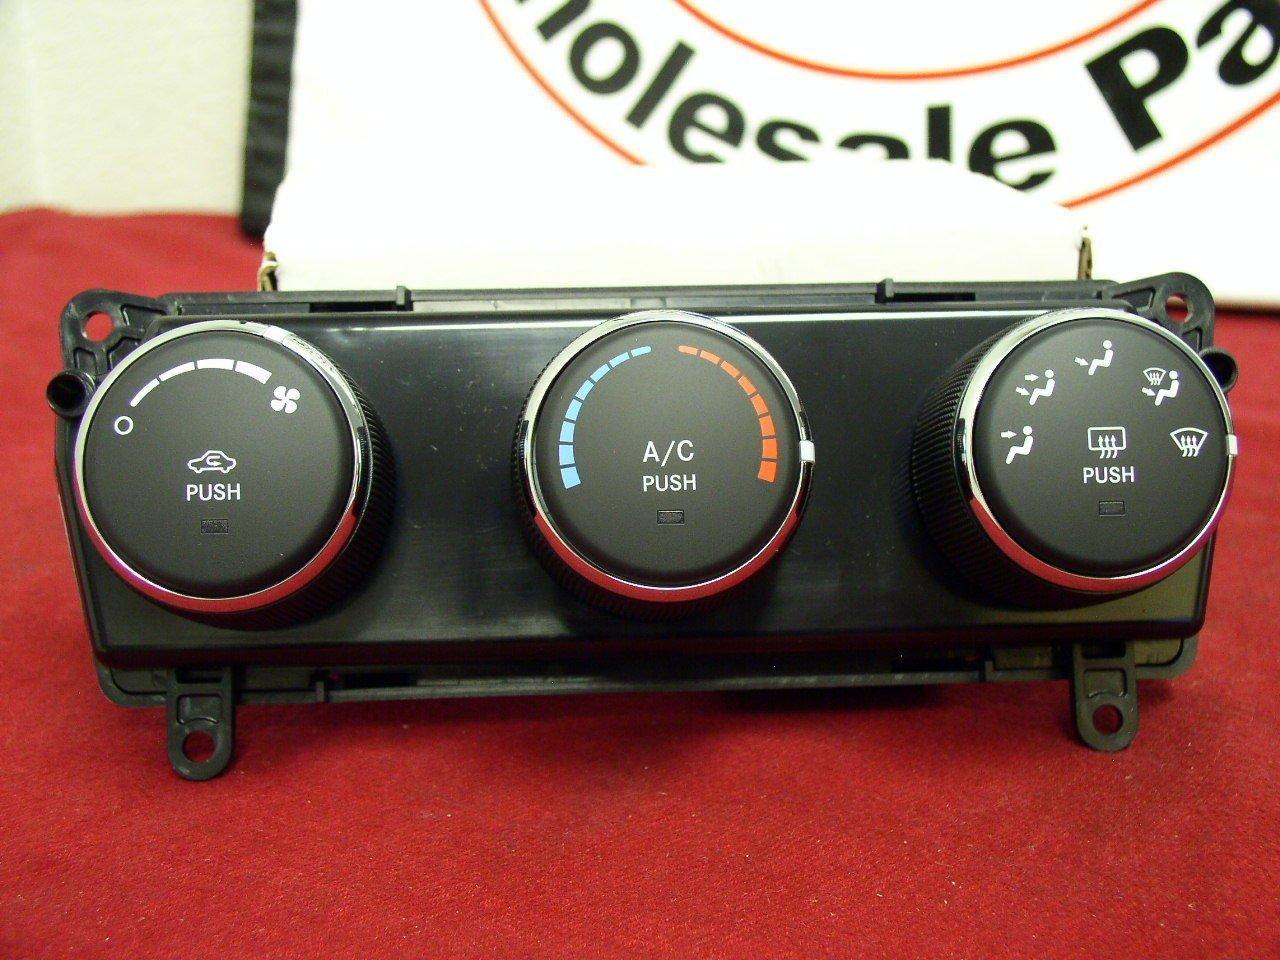 Dodge Challenger 2009-2010 A/C AC control head switch temperature control Mopar NCOREDSHKF453